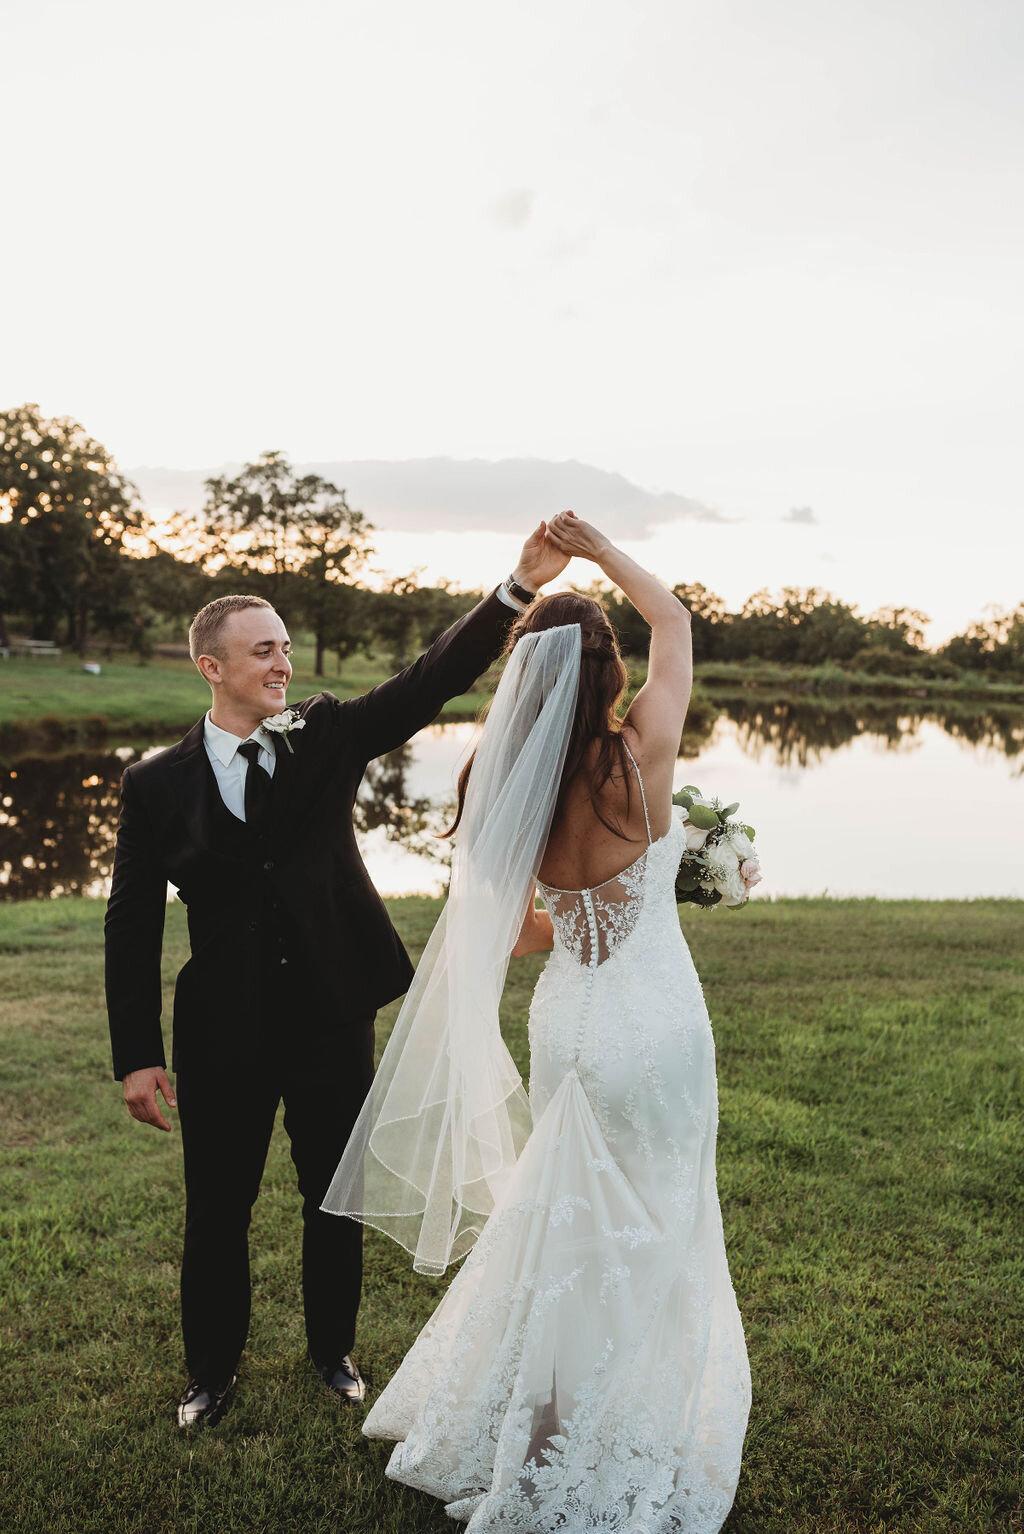 Tulsa Wedding Venue with a View 42.jpg